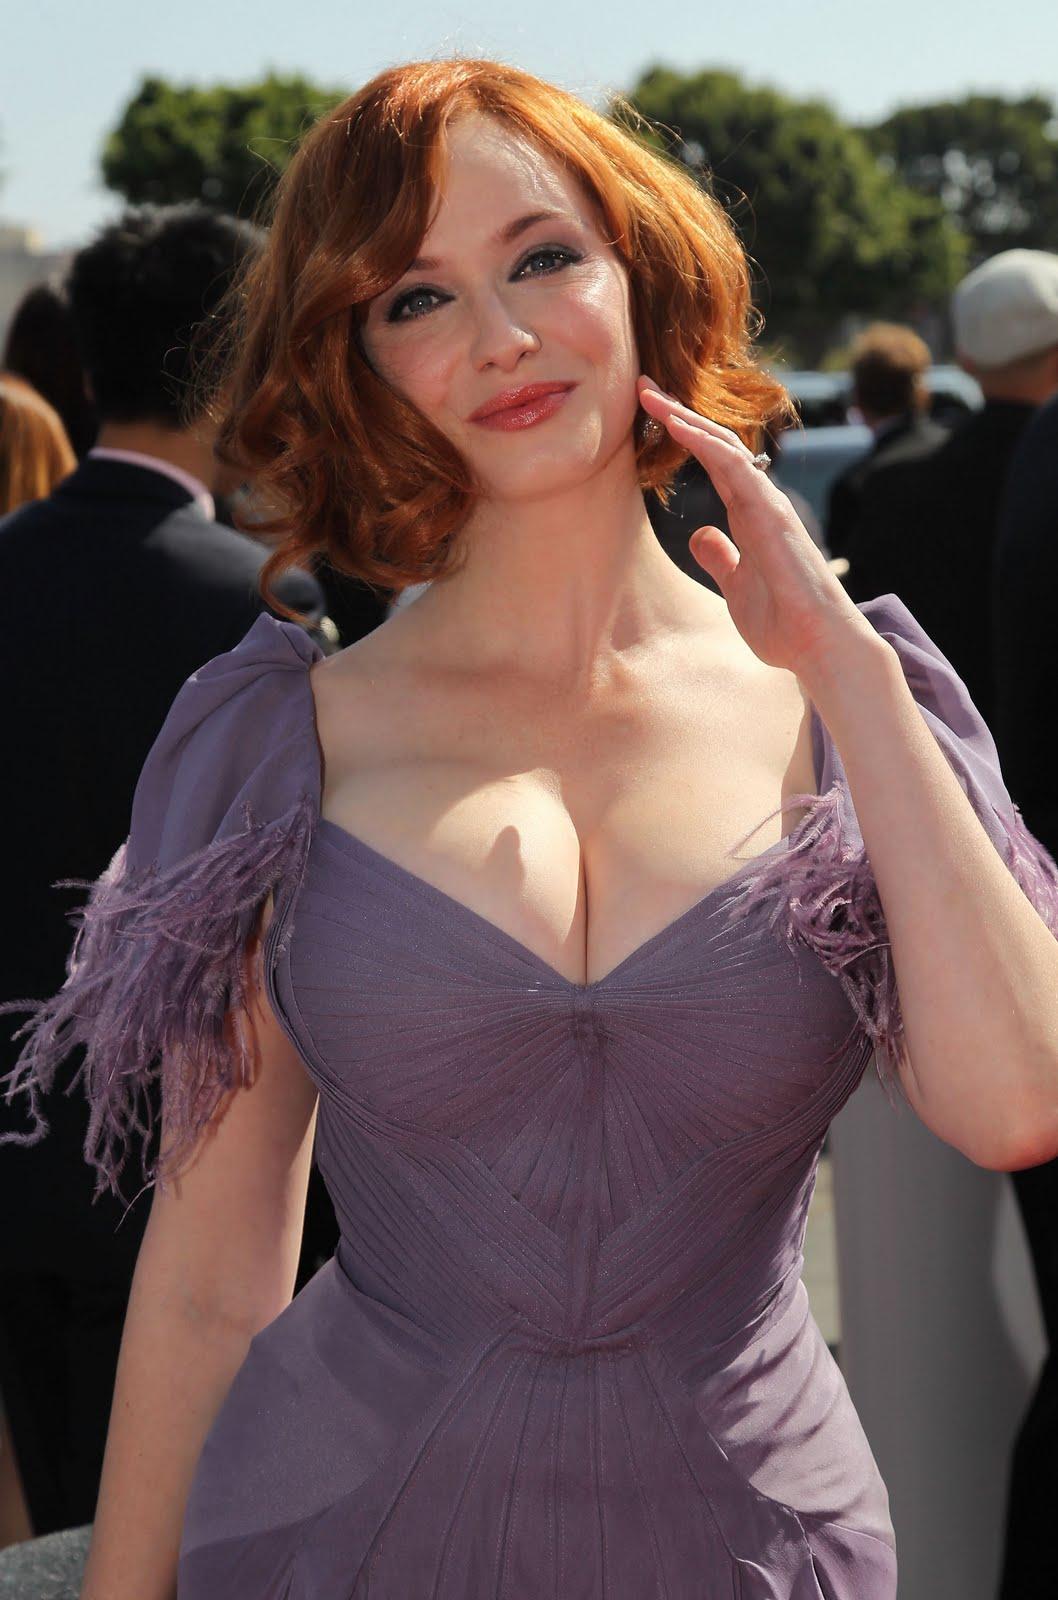 http://1.bp.blogspot.com/_TsLCLDRh1kY/TUVf-jmvdcI/AAAAAAAABDE/Xp4E5U6Iijs/s1600/christina-hendricks-boobs_boobs_1.jpg